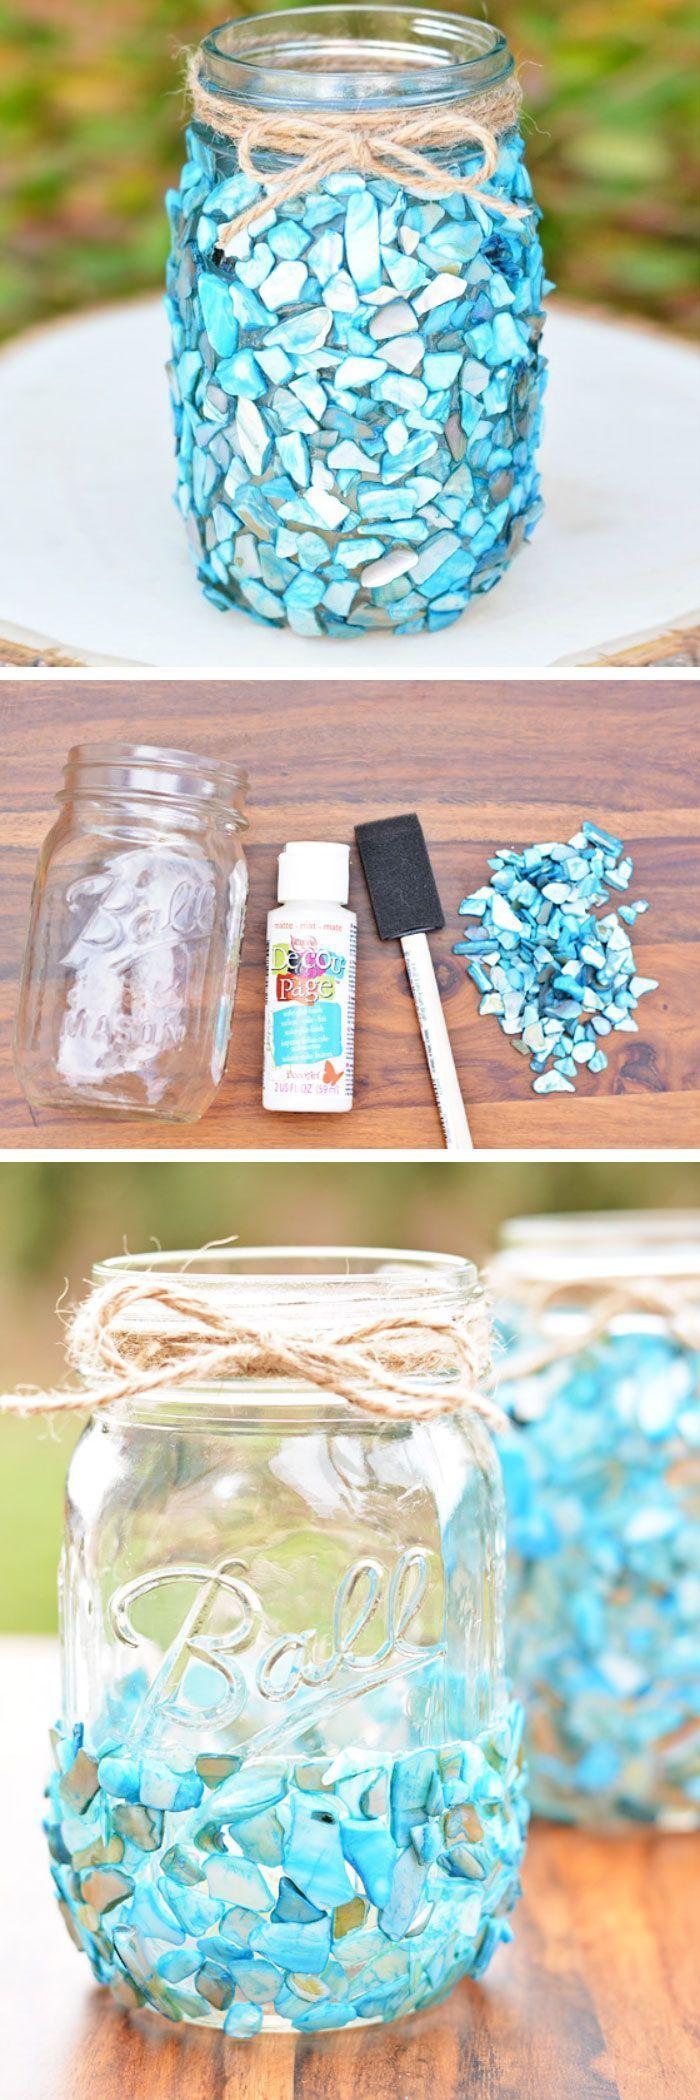 17 Best Ideas About Seashell Crafts On Pinterest Seashell Crafts Kids Sea